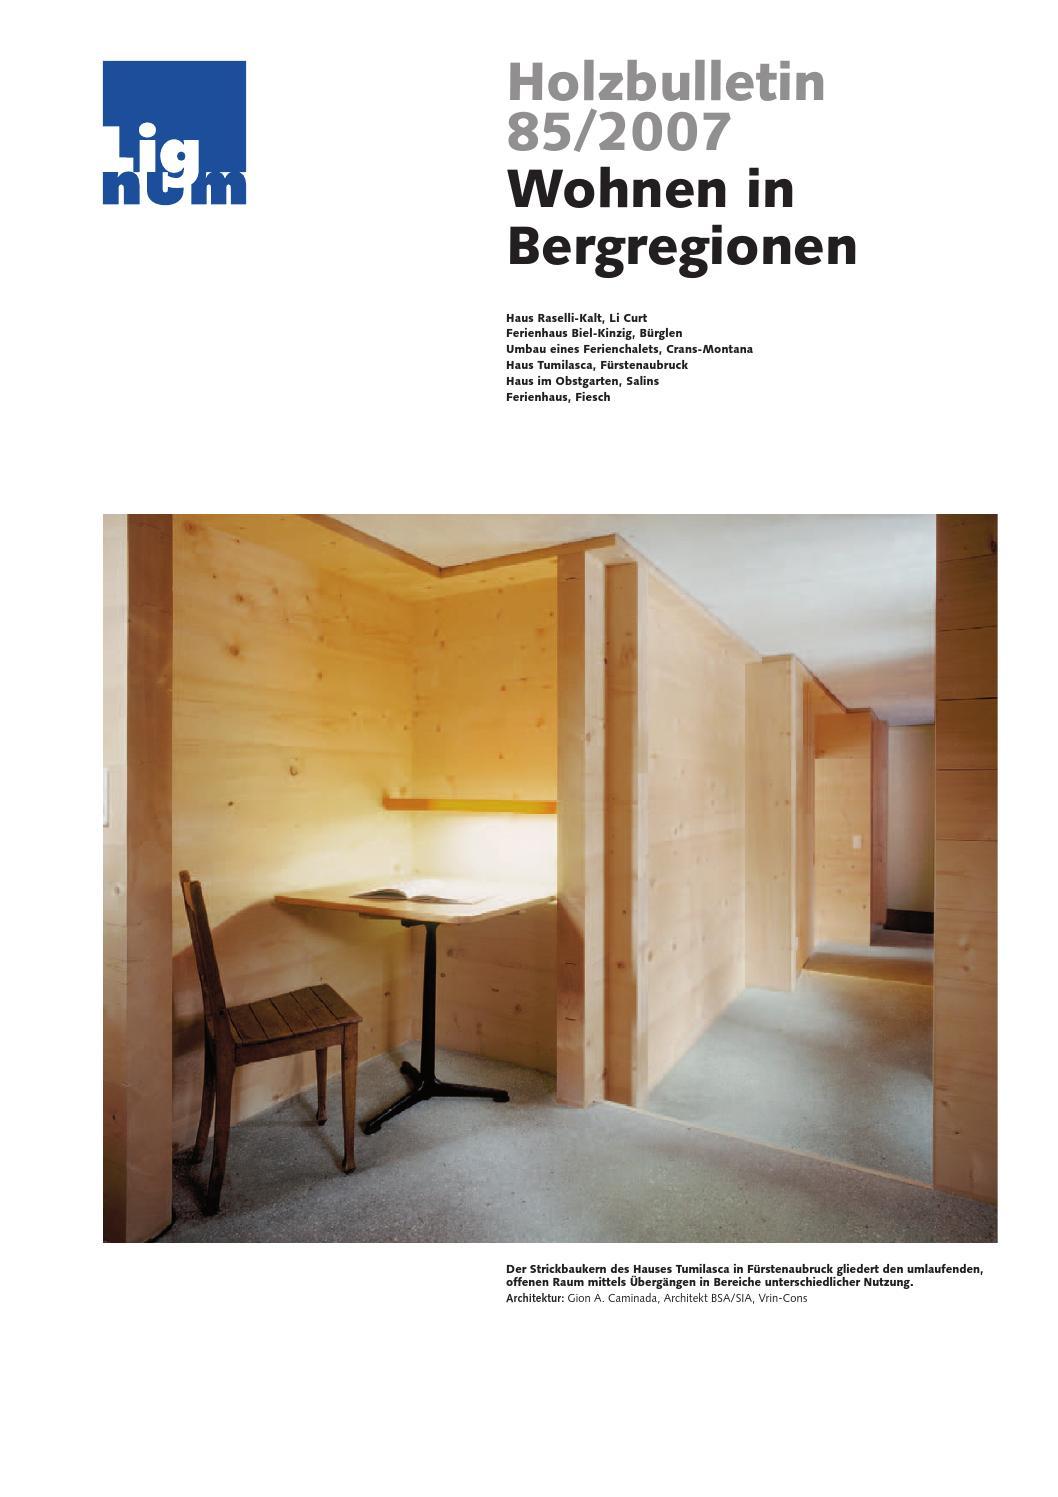 Holzbulletin 85/2007 by Lignum - issuu